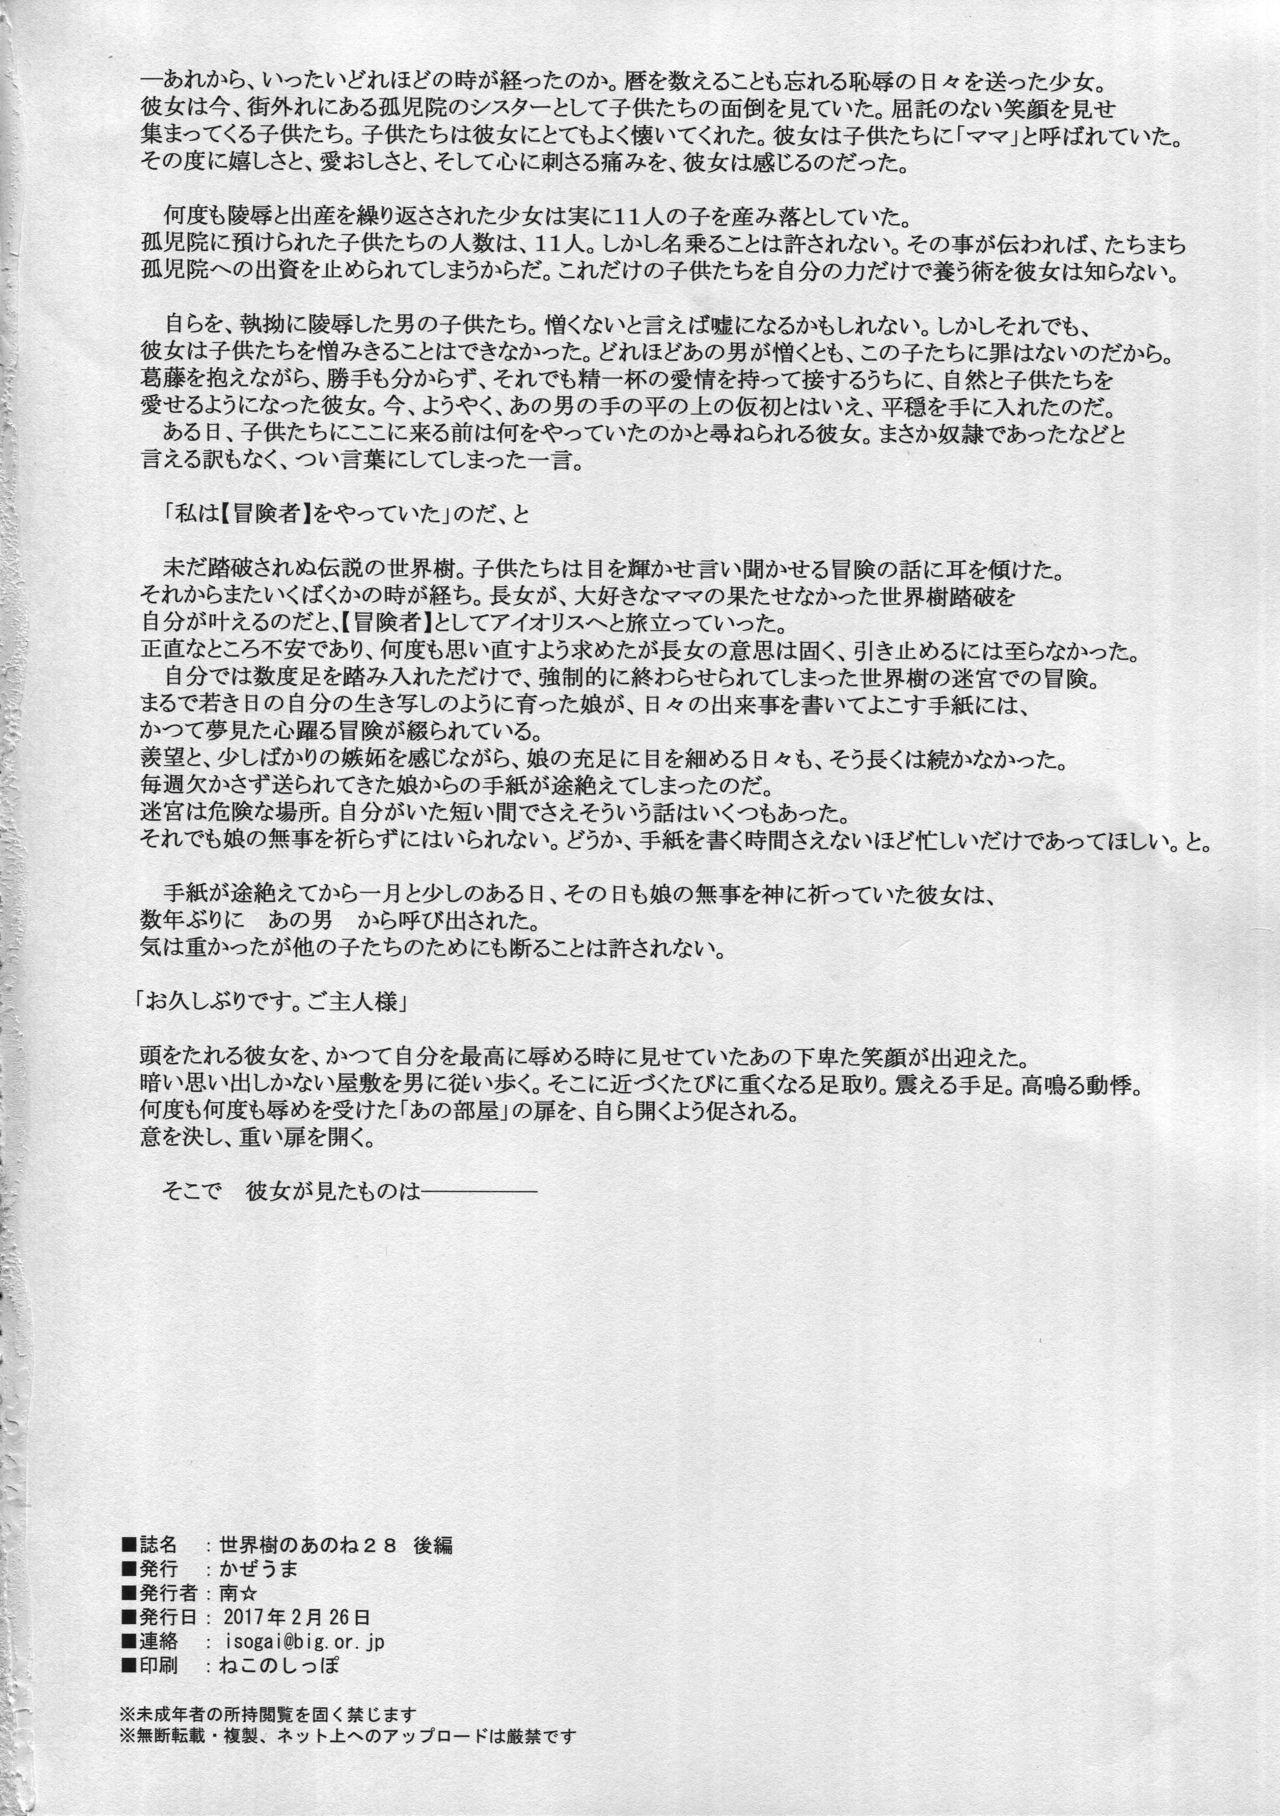 Sekaiju no Anone 28 Kouhen 41